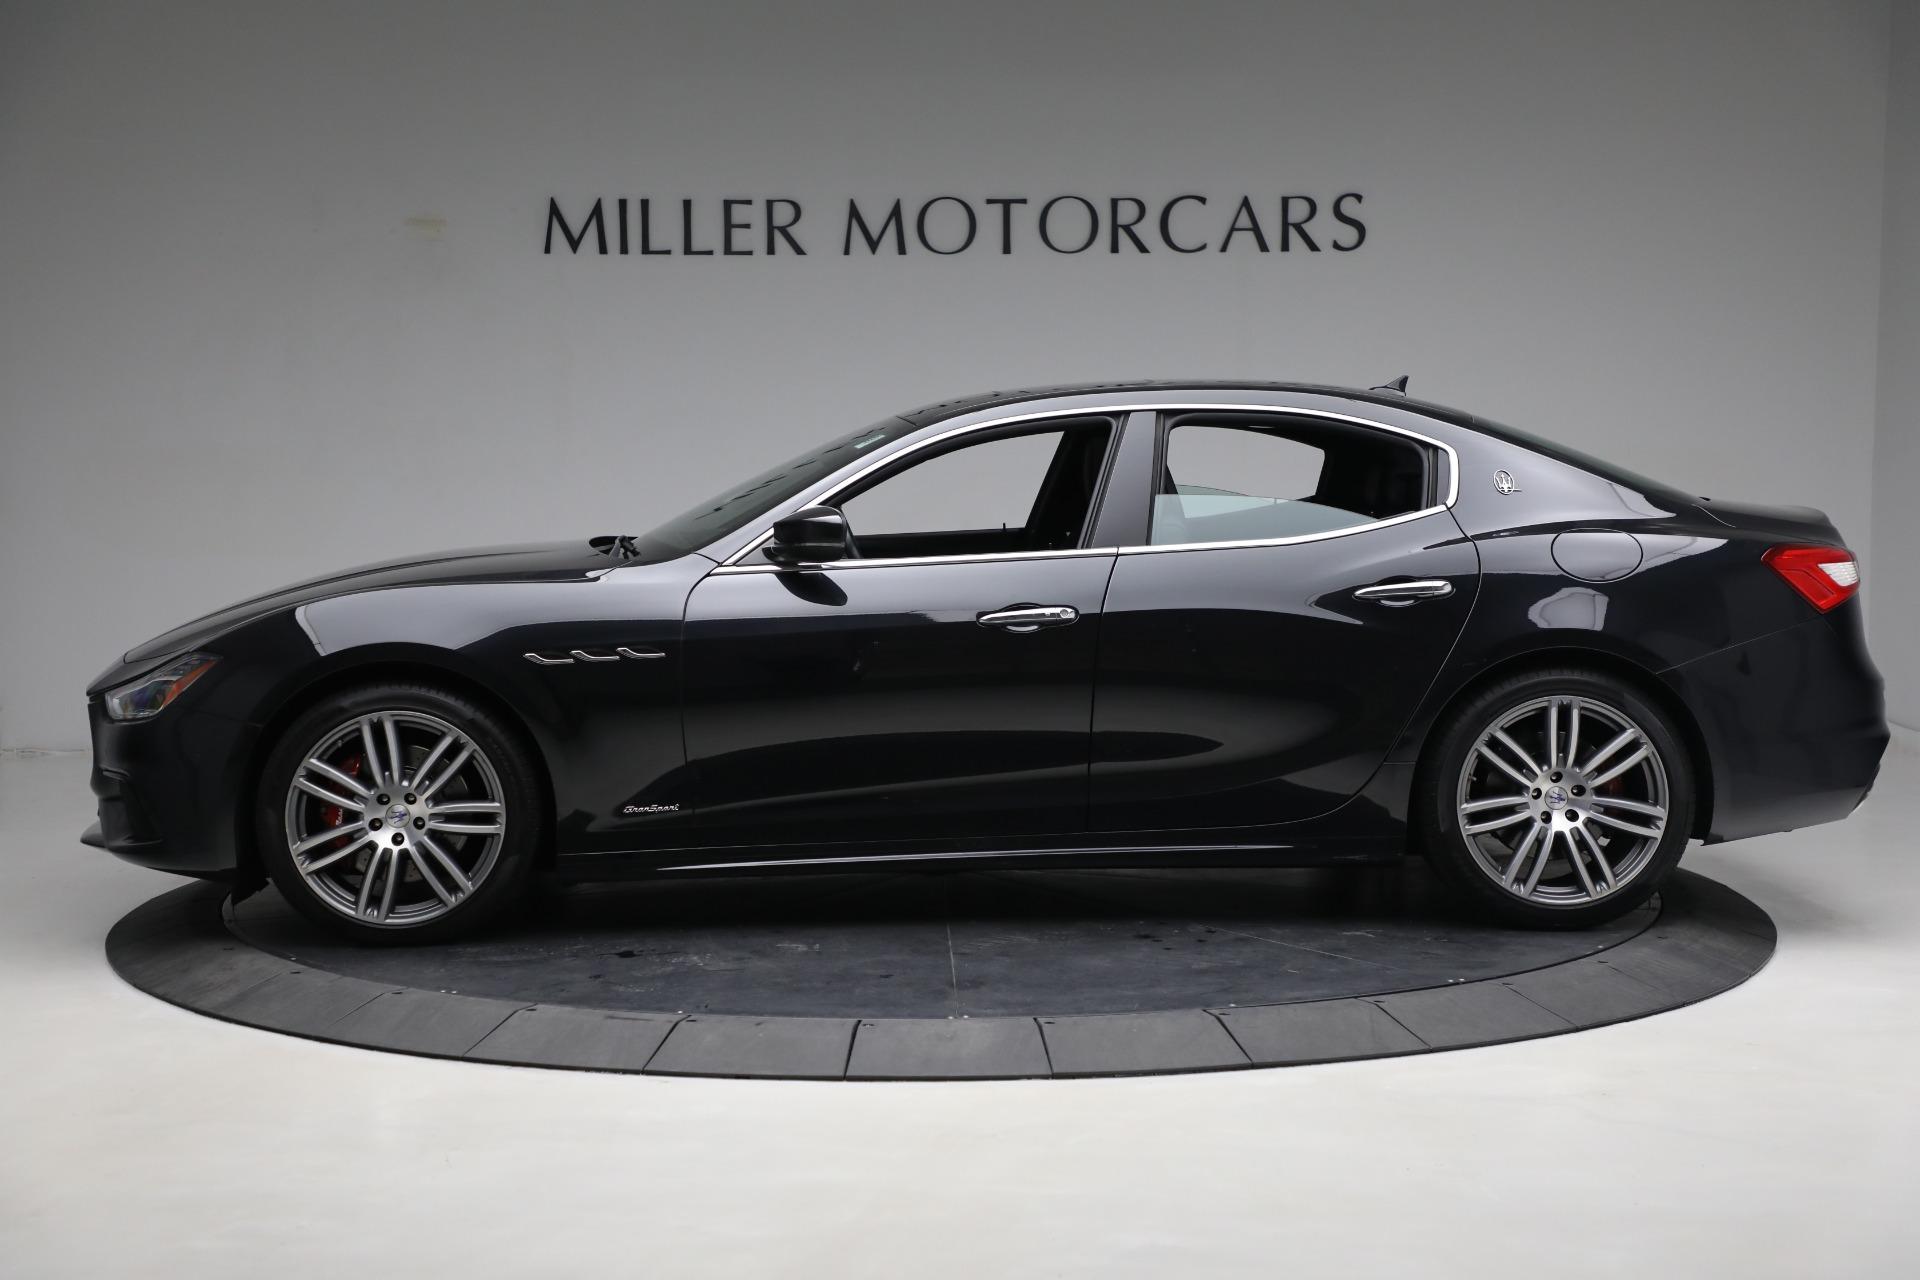 New 2019 Maserati Ghibli S Q4 GranSport For Sale In Westport, CT 2597_p3